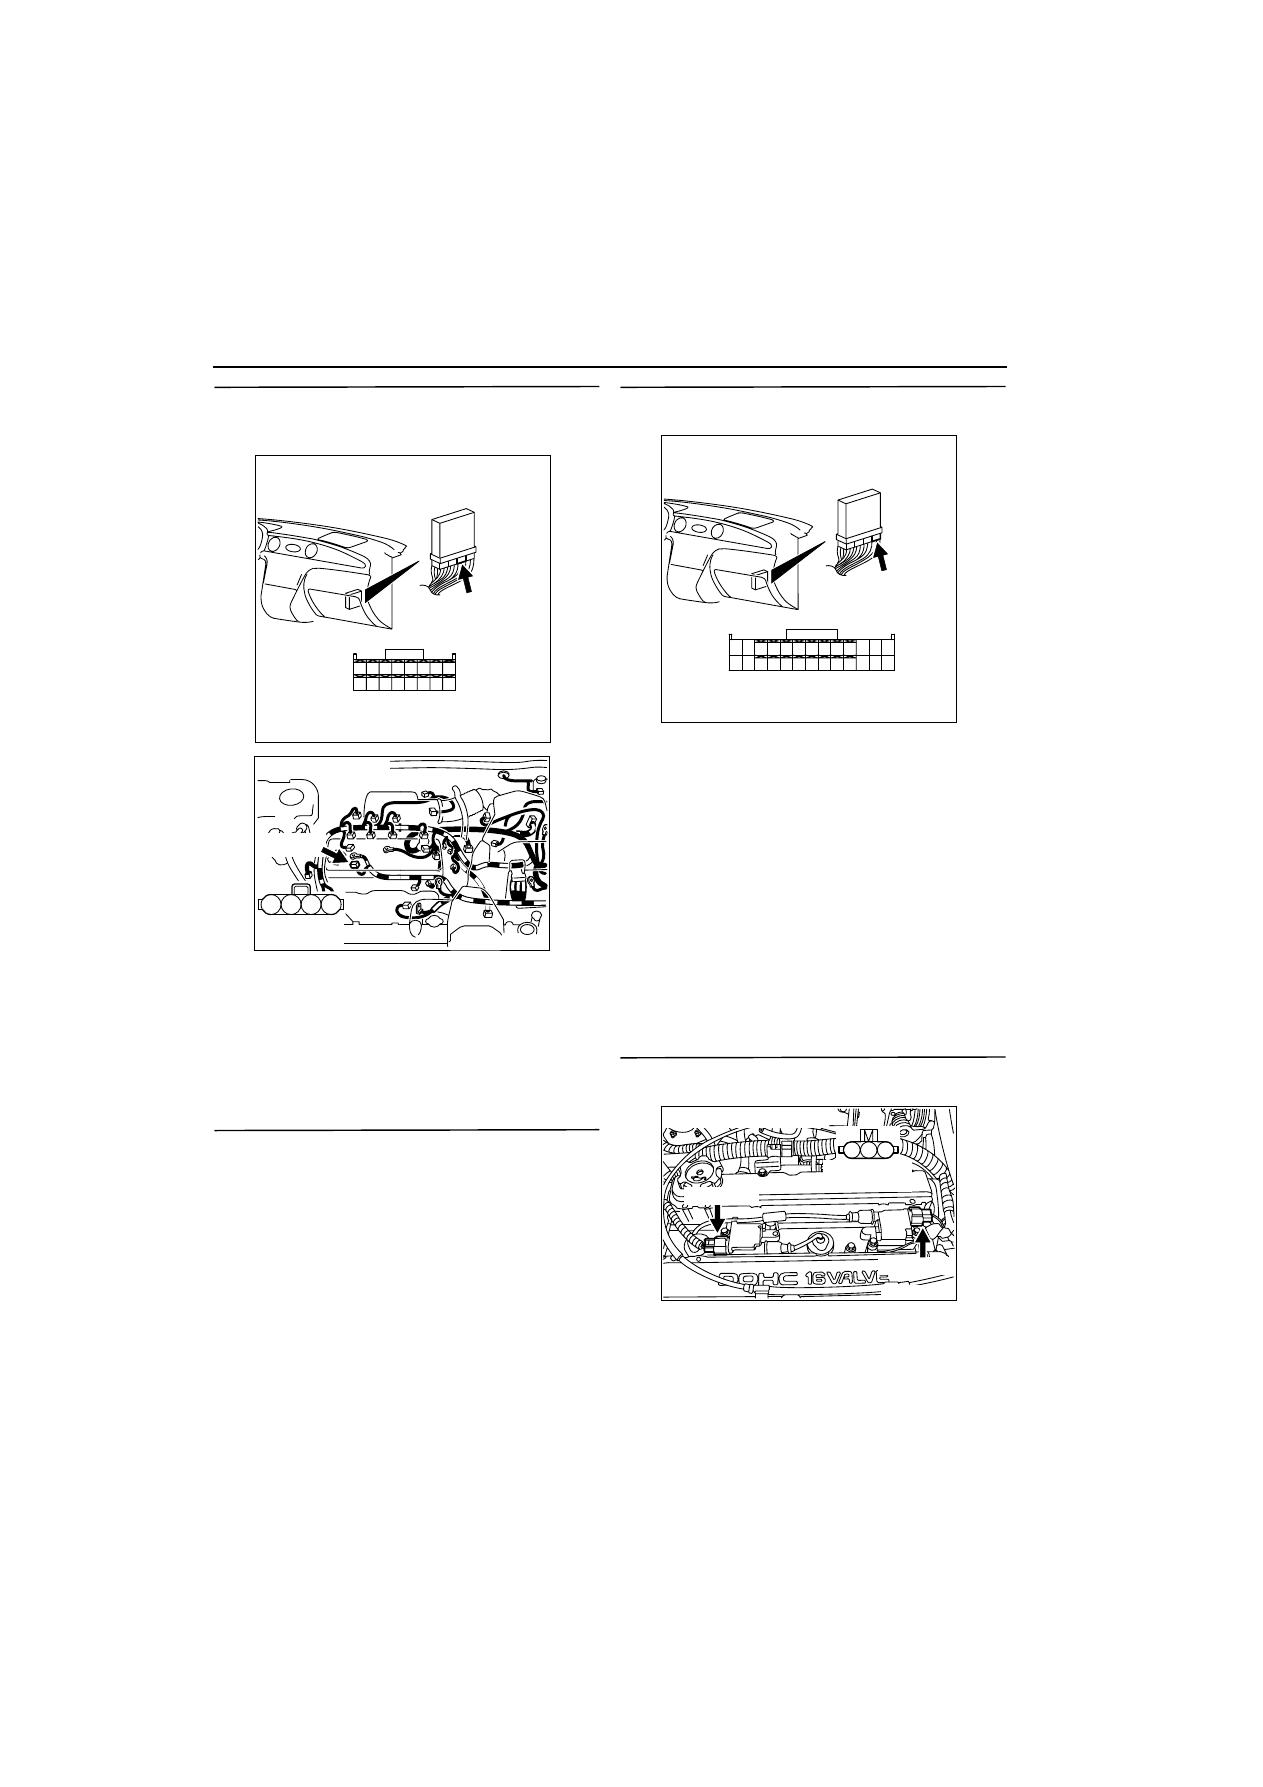 mitsubishi outlander 2003 manual part 86 rh zinref ru